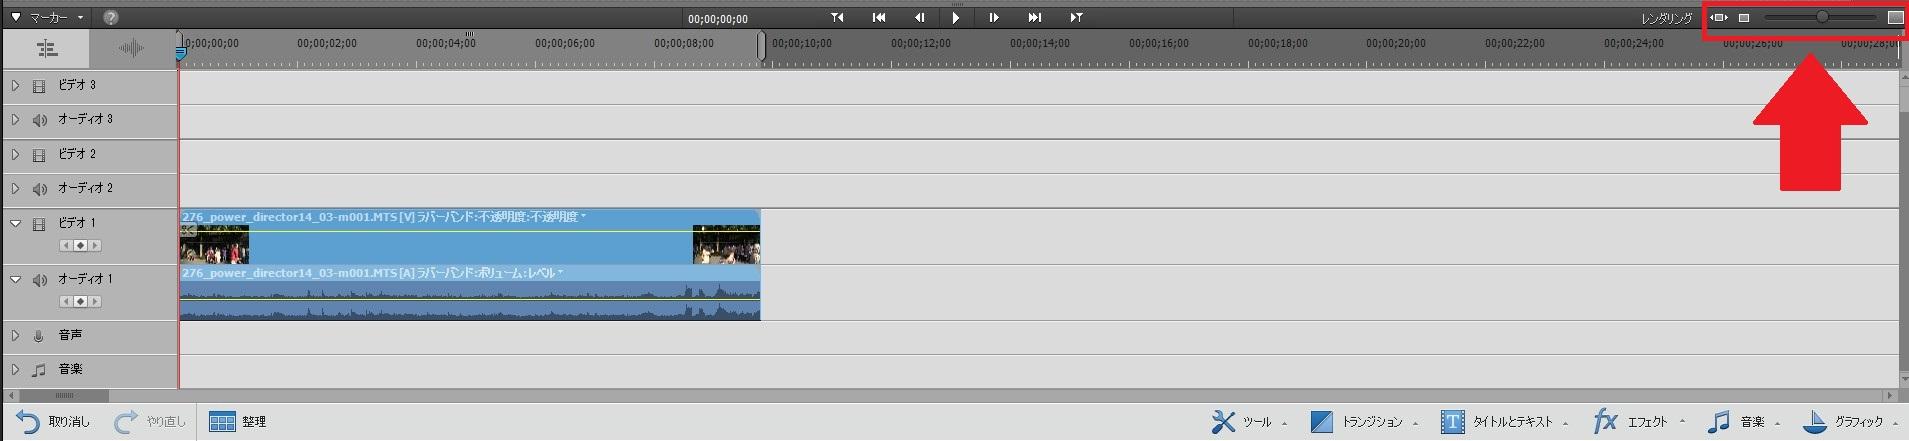 Adobe Premiere Elements14の使い方 基本的な操作方法 タイムラインの拡大縮小